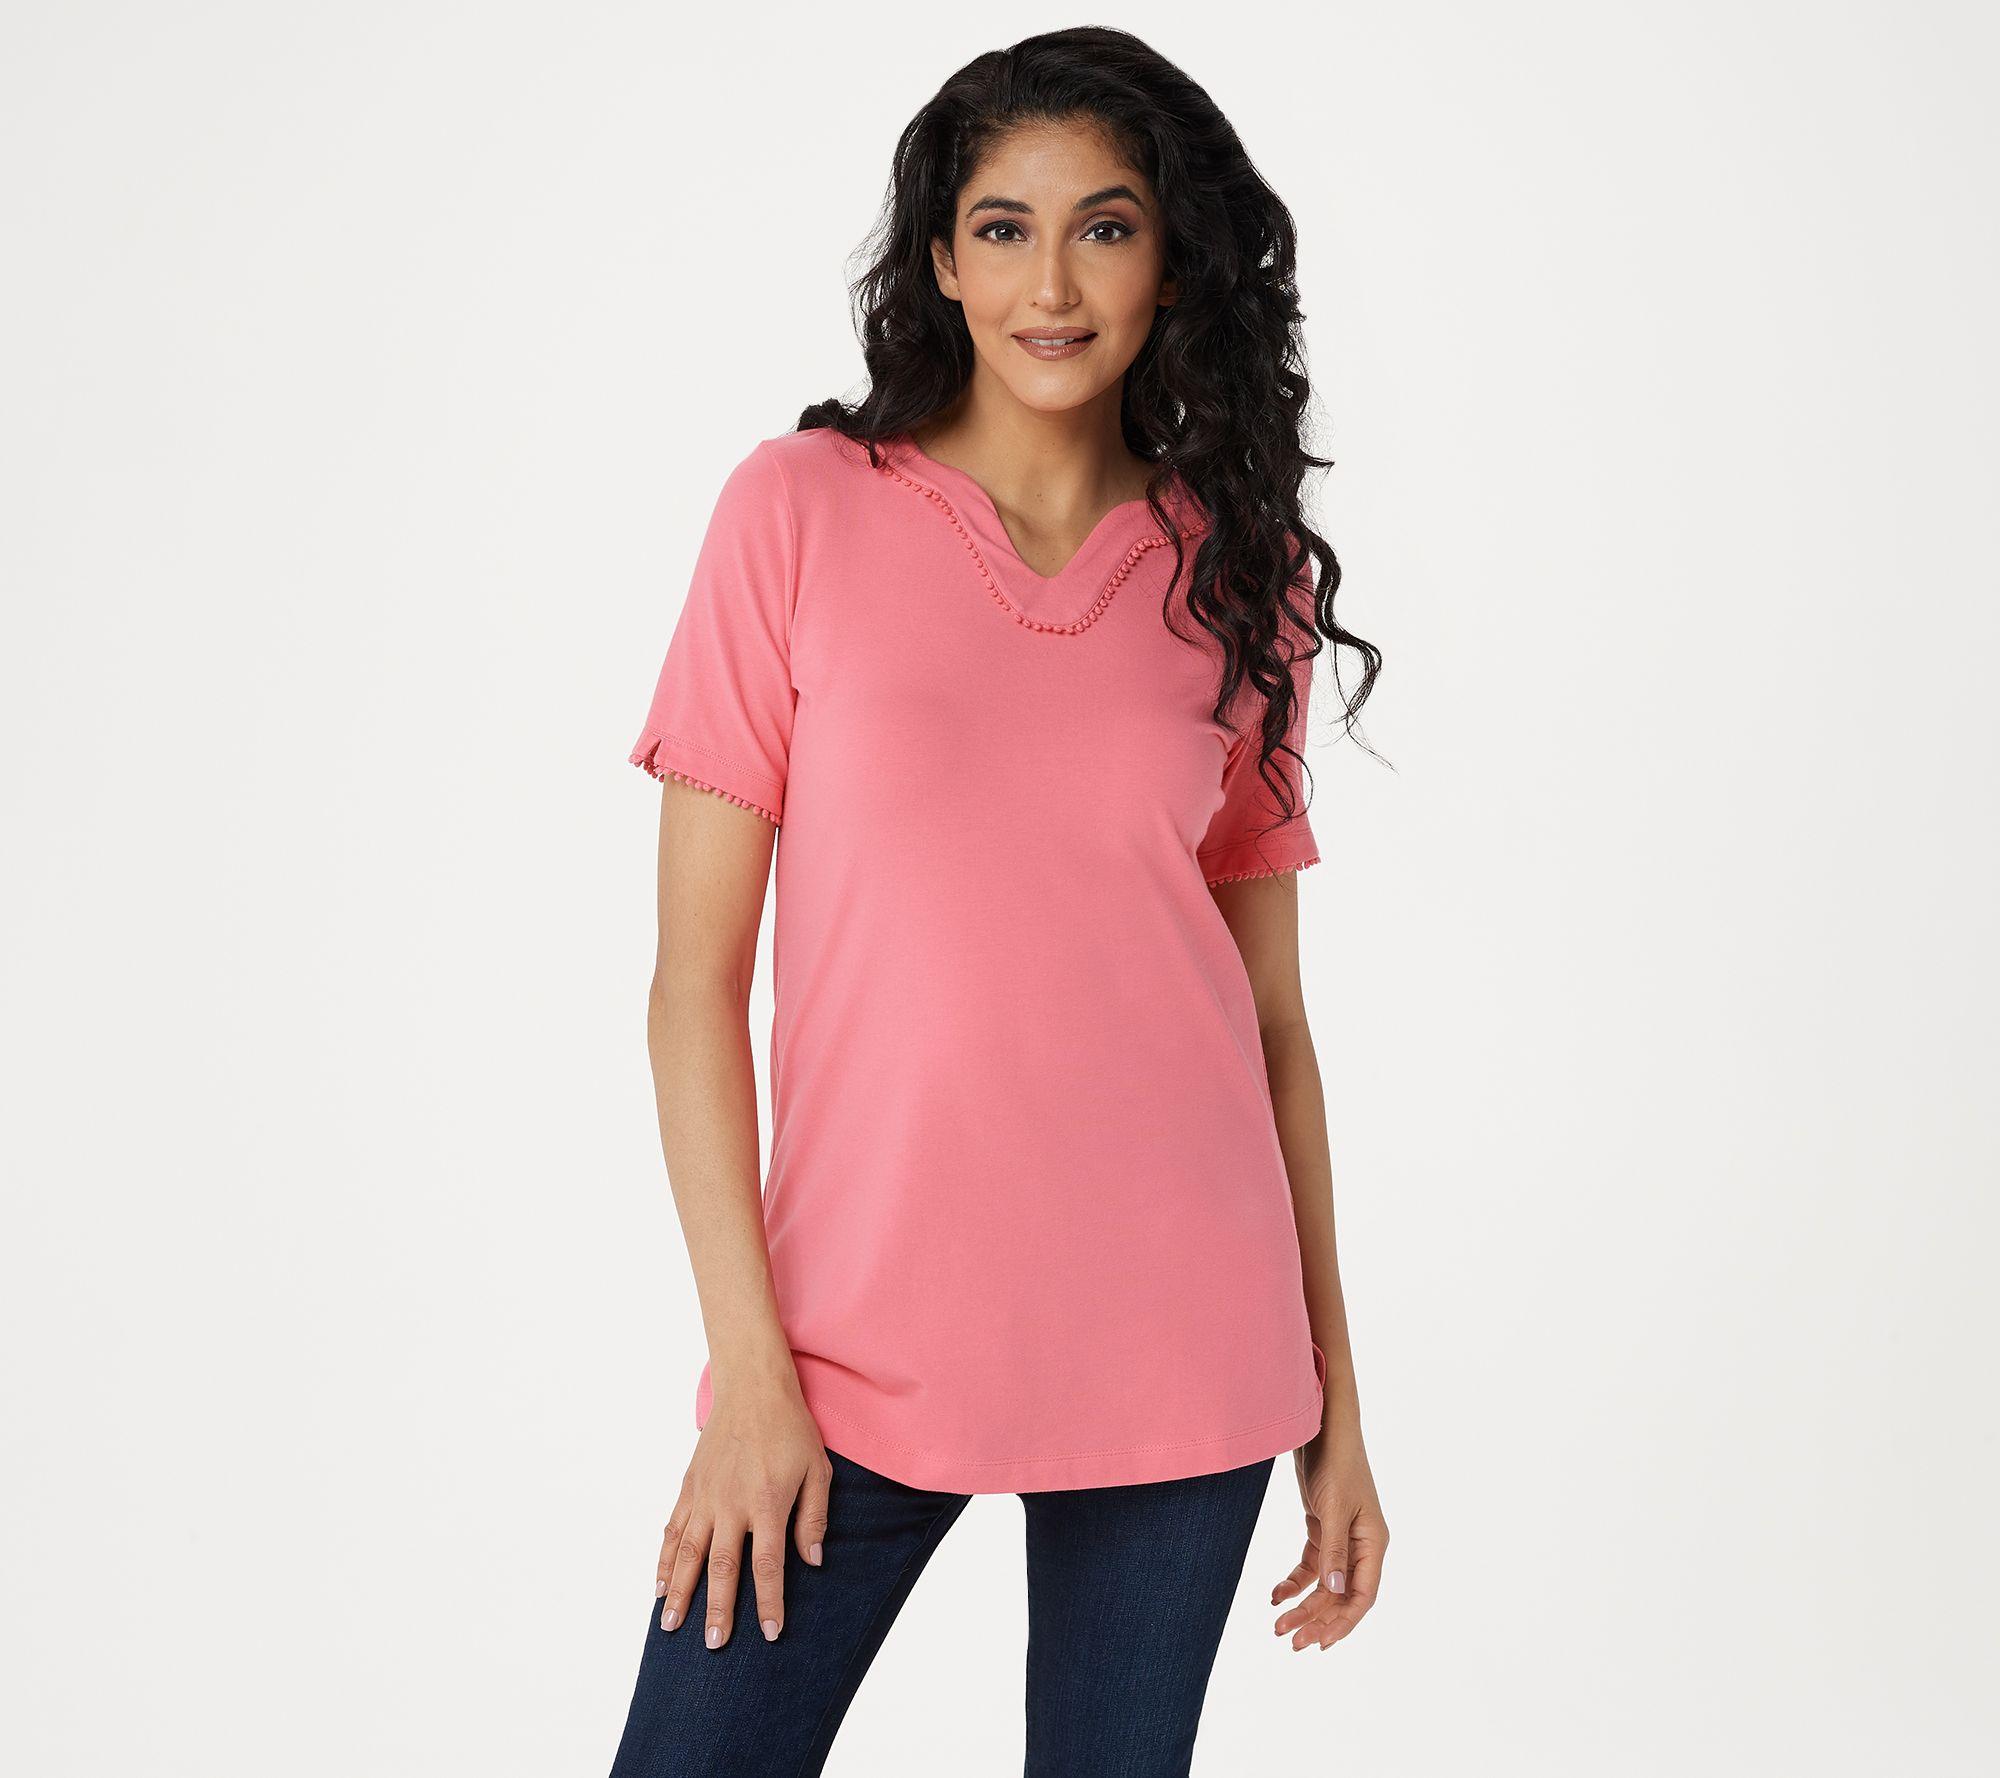 Denim /& Co Round Neck Top w// Lace Short Sleeves /& Pocket White Medium Size QVC